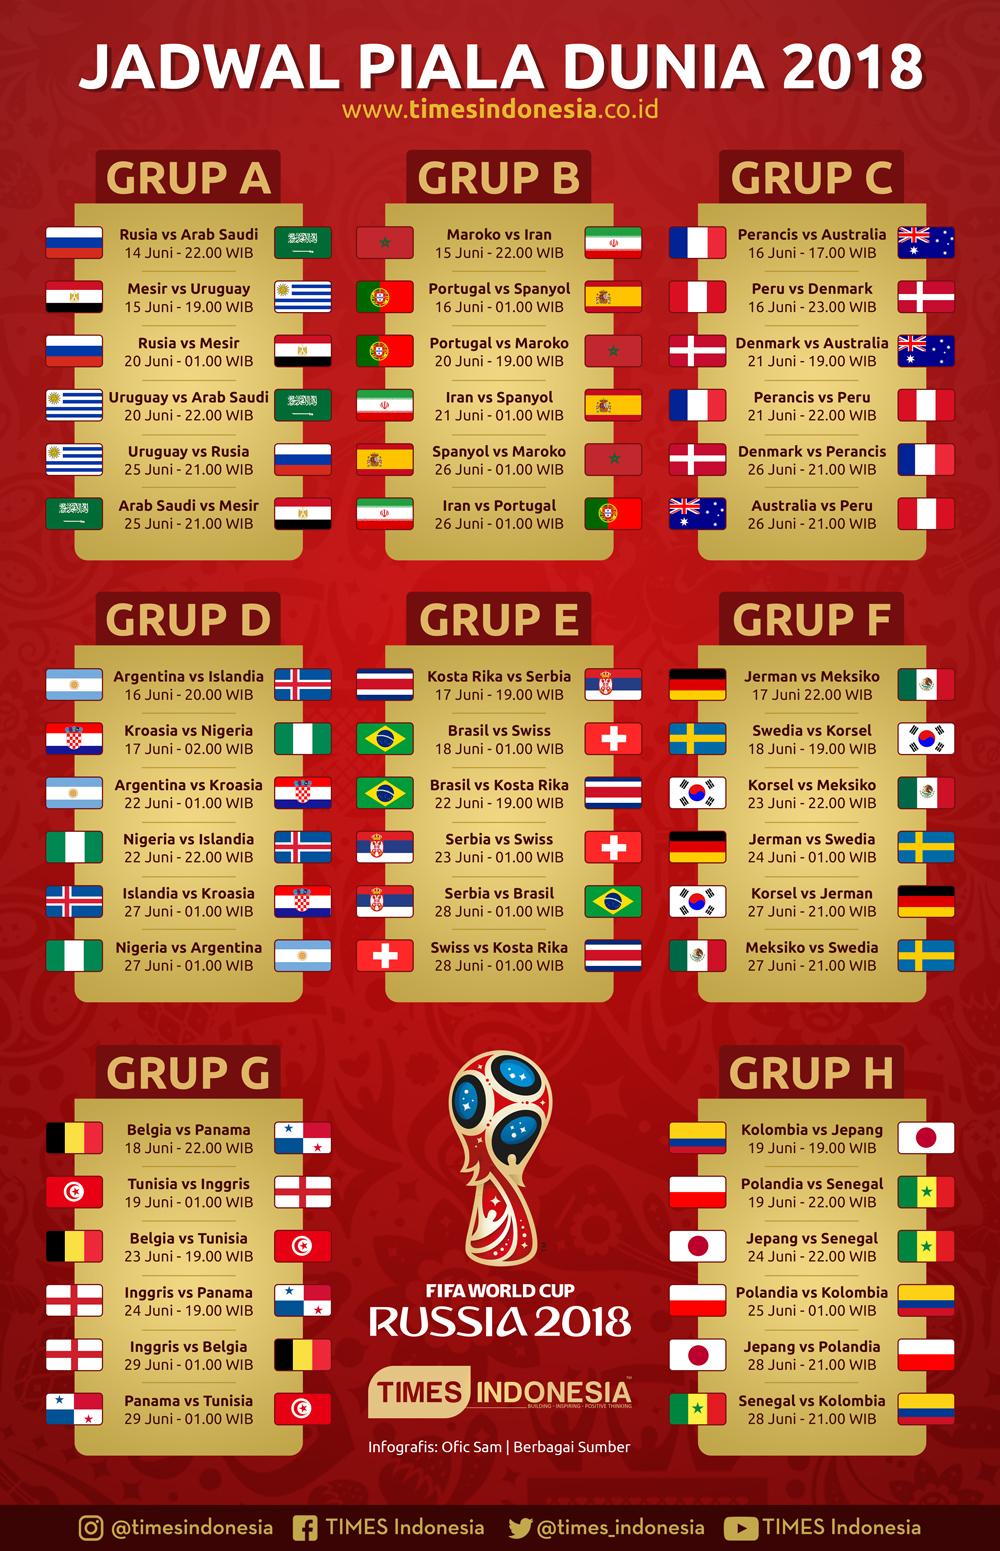 Jadwal Piala Dunia 2018 Rusia - Siaran Langsung Transmedia ...